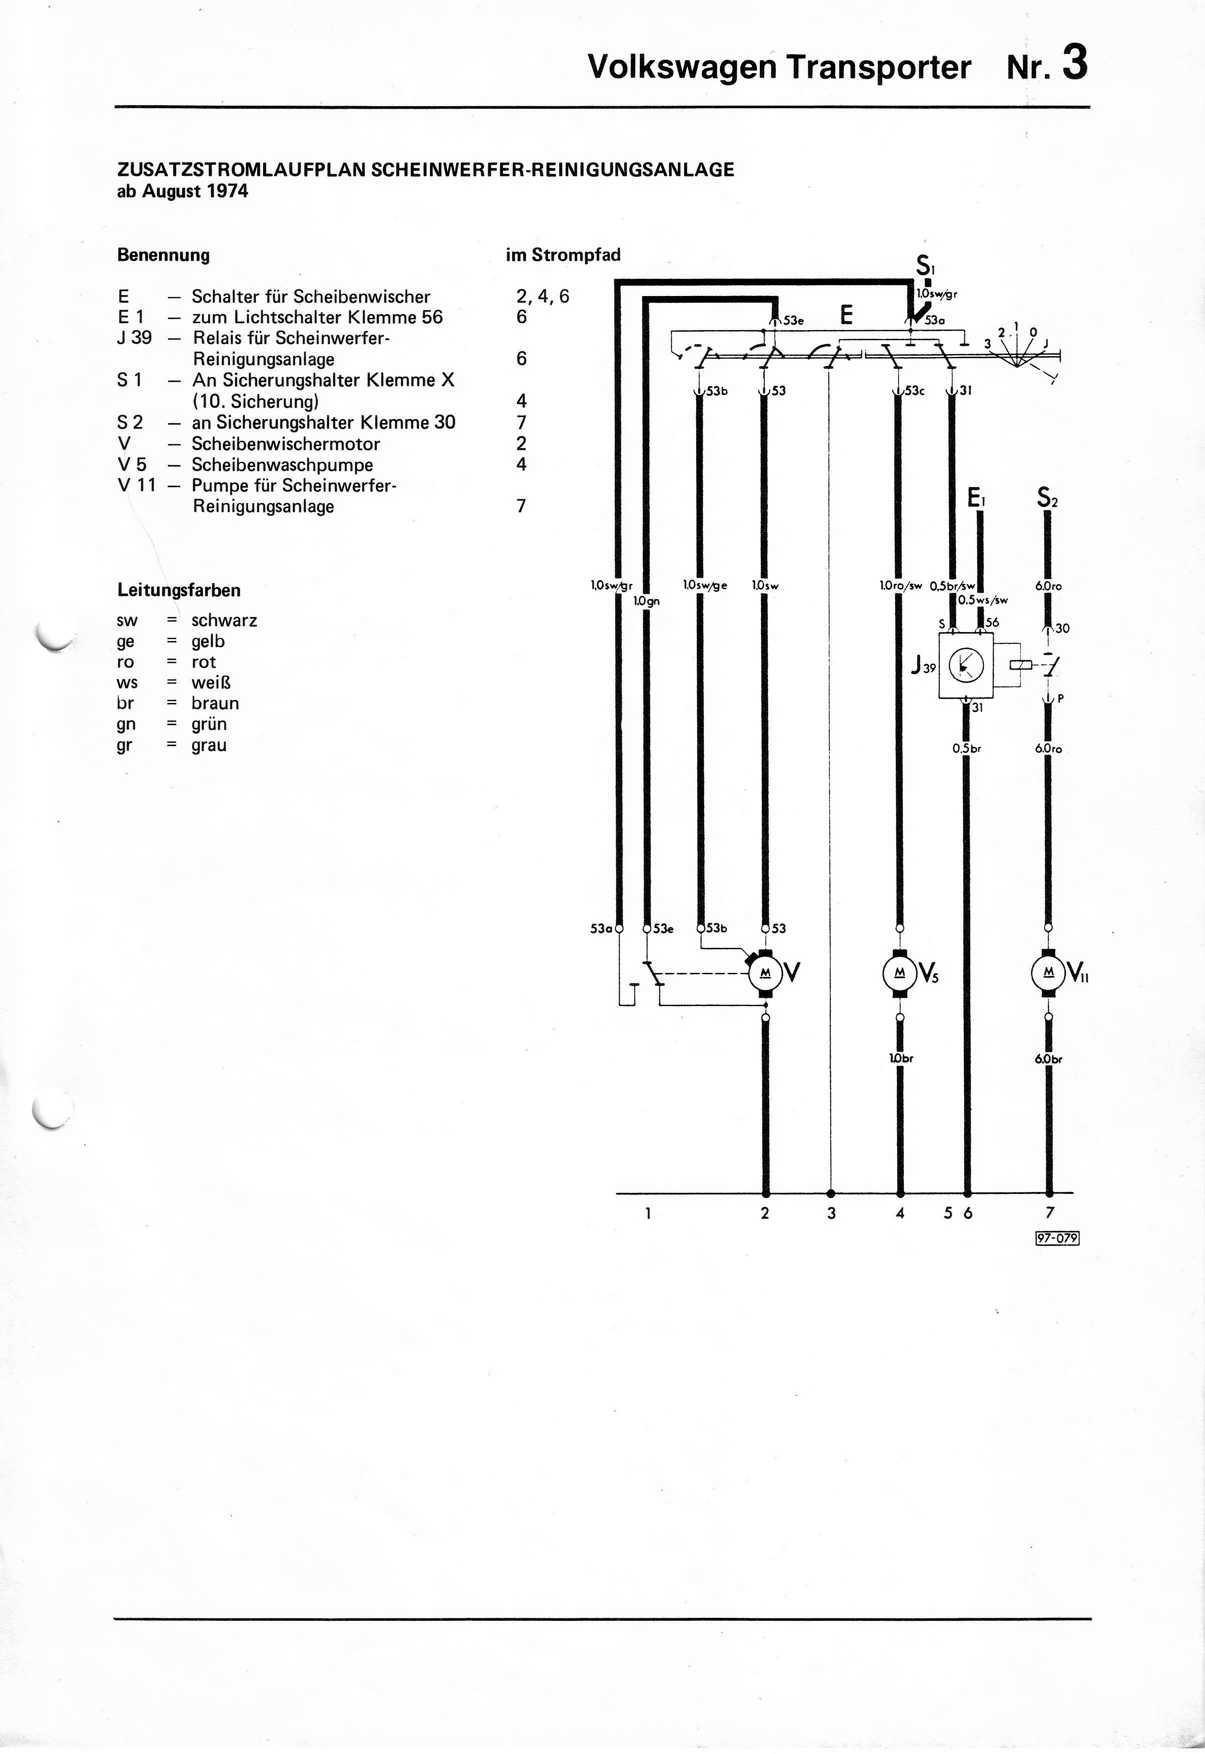 vw t2 1970 wiring diagram 3 way dimmer transporter 1976 free engine